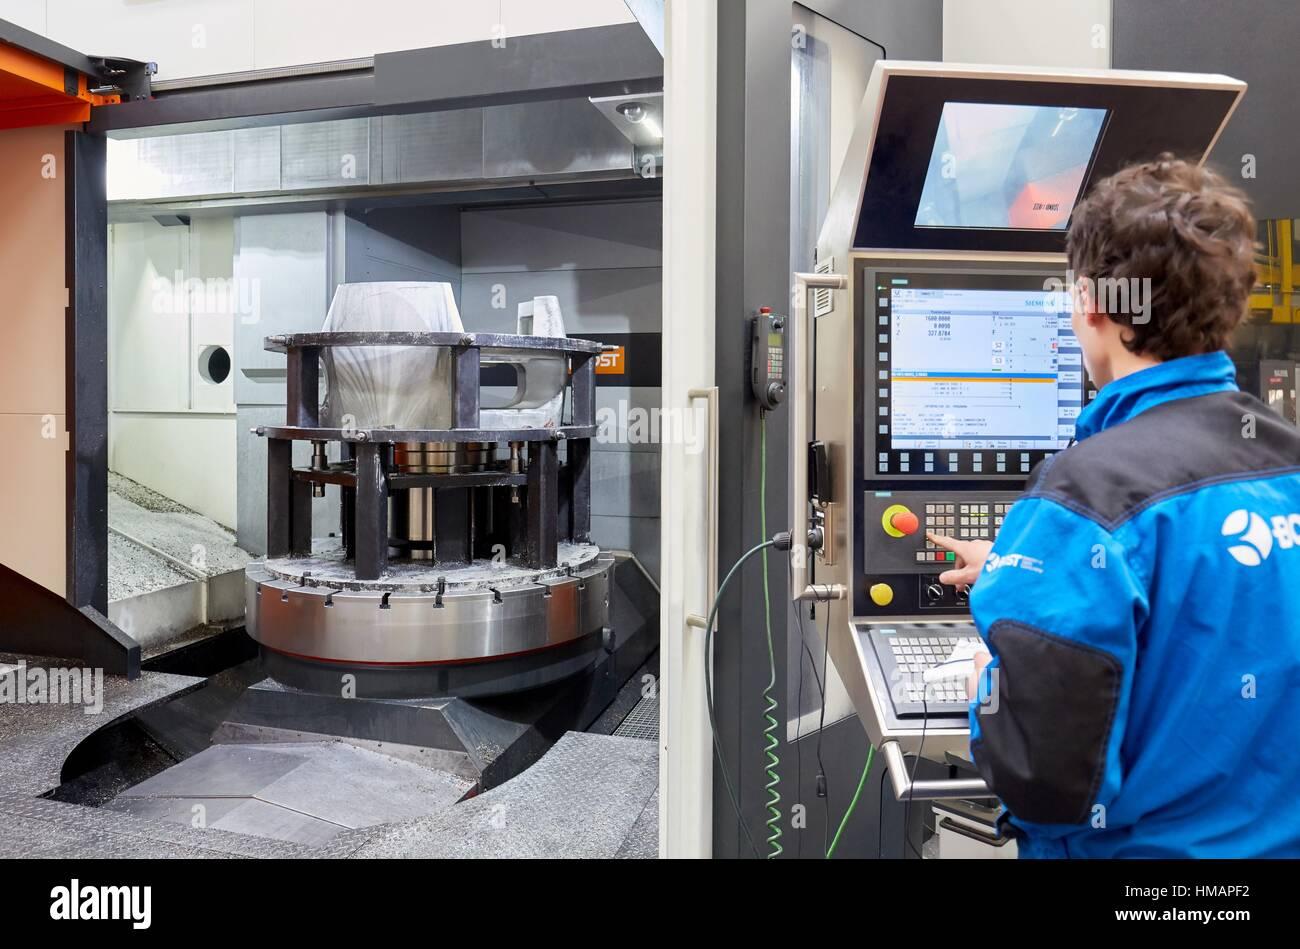 Bearbeitungszentrum. CNC. Vertikal-Drehmaschine. Werkzeugmaschinen-Unternehmen. Gipuzkoa. Baskisches Land. Spanien. Stockbild